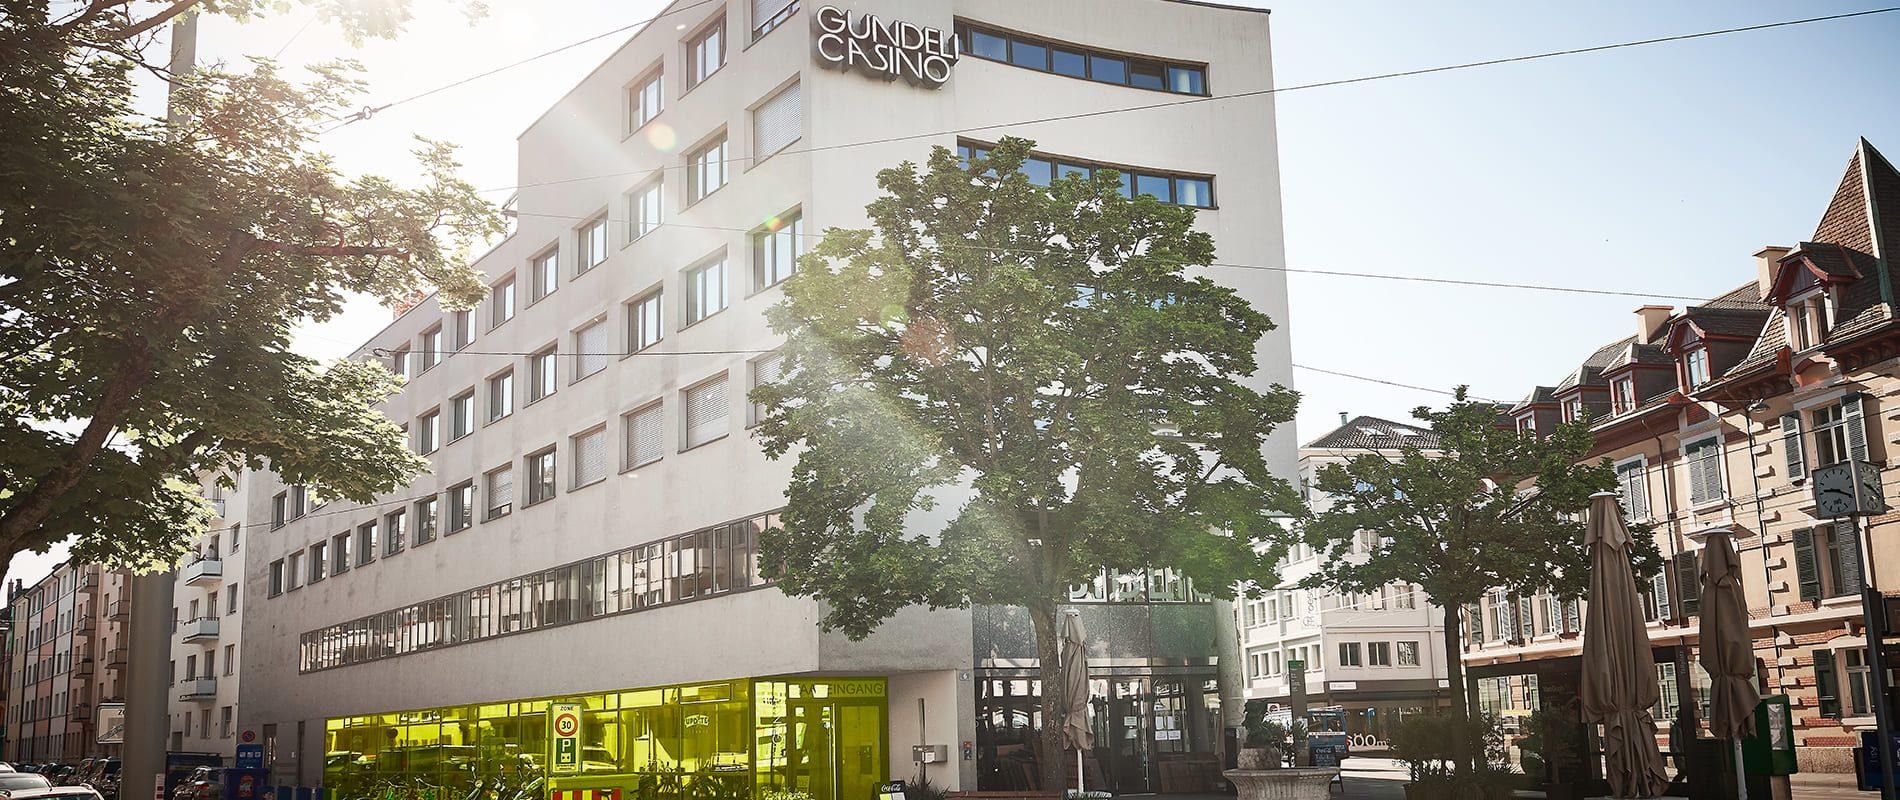 update Fitness Basel Gundeli - Gebäude